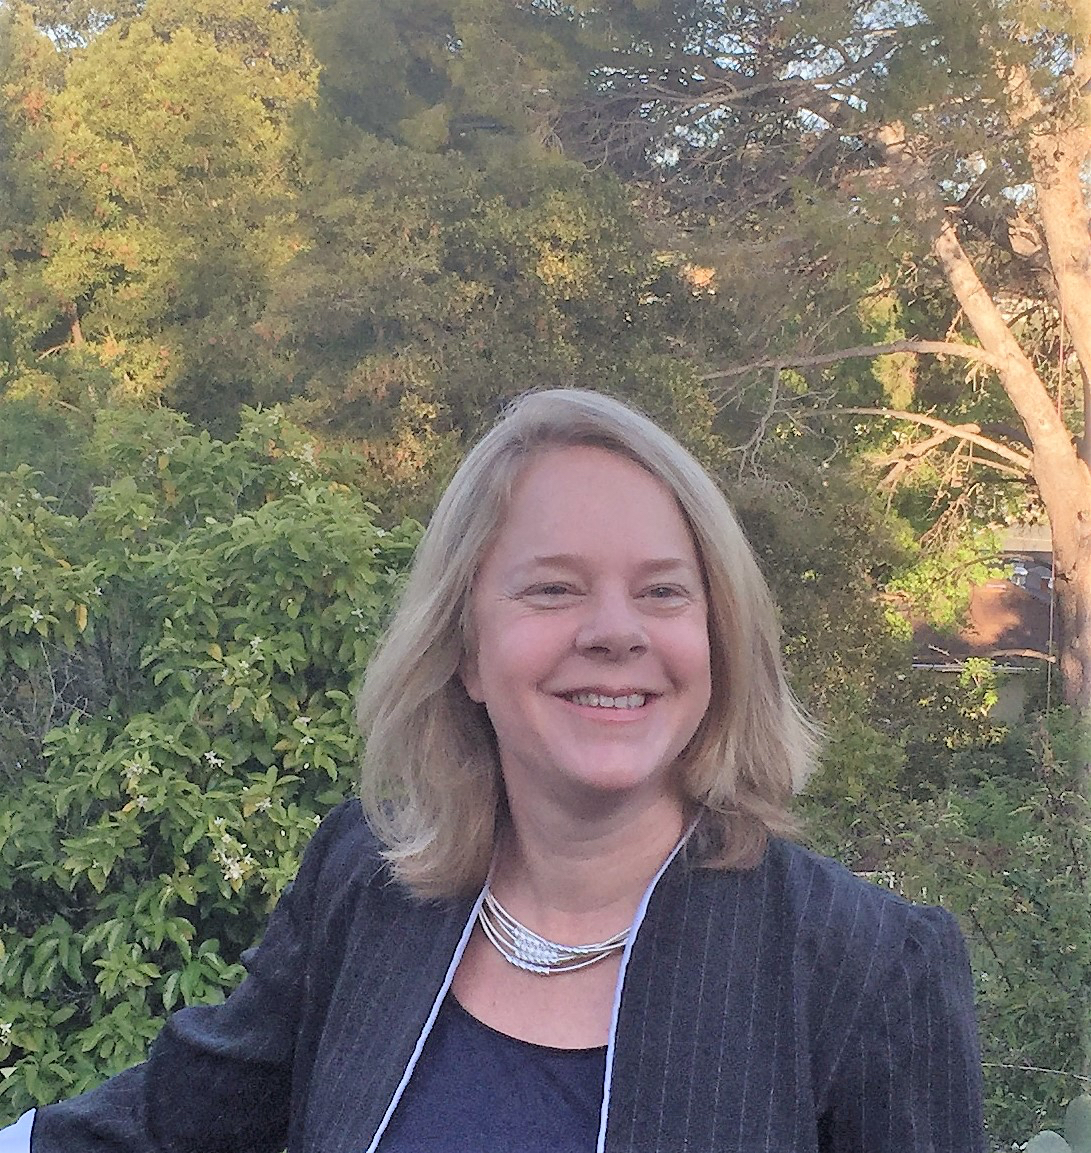 Christine Kohl-Zaugg